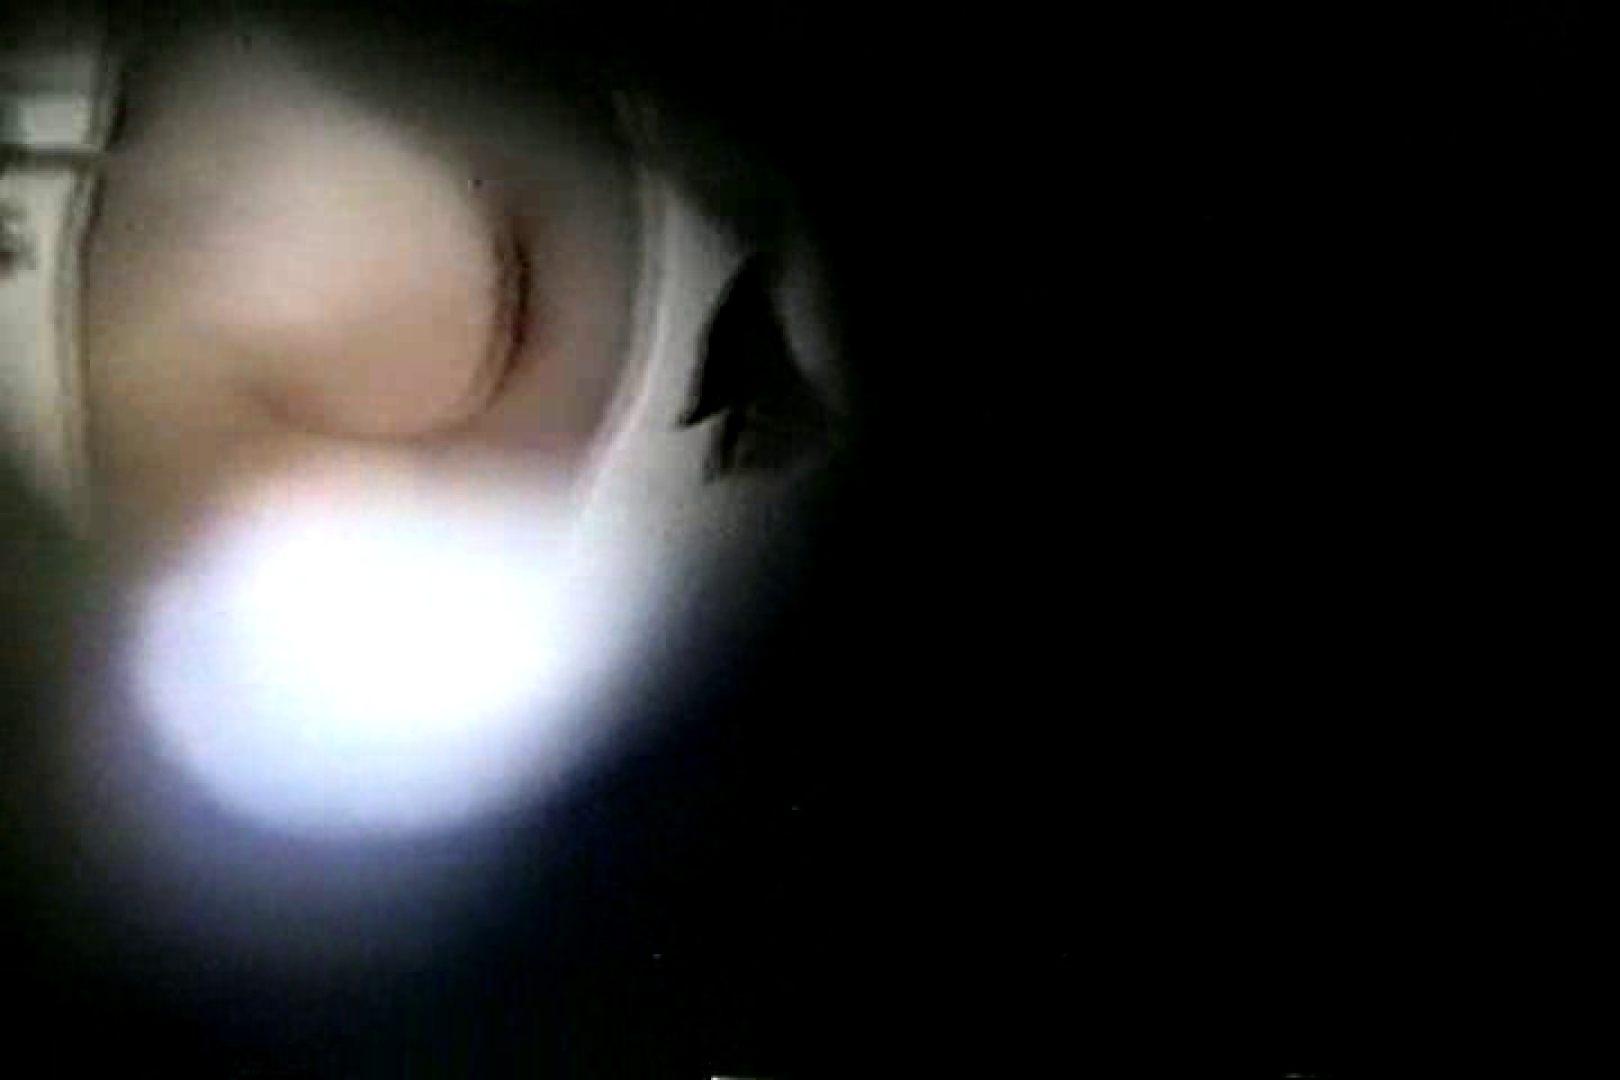 深夜の撮影会Vol.6 覗き 濡れ場動画紹介 109PIX 109